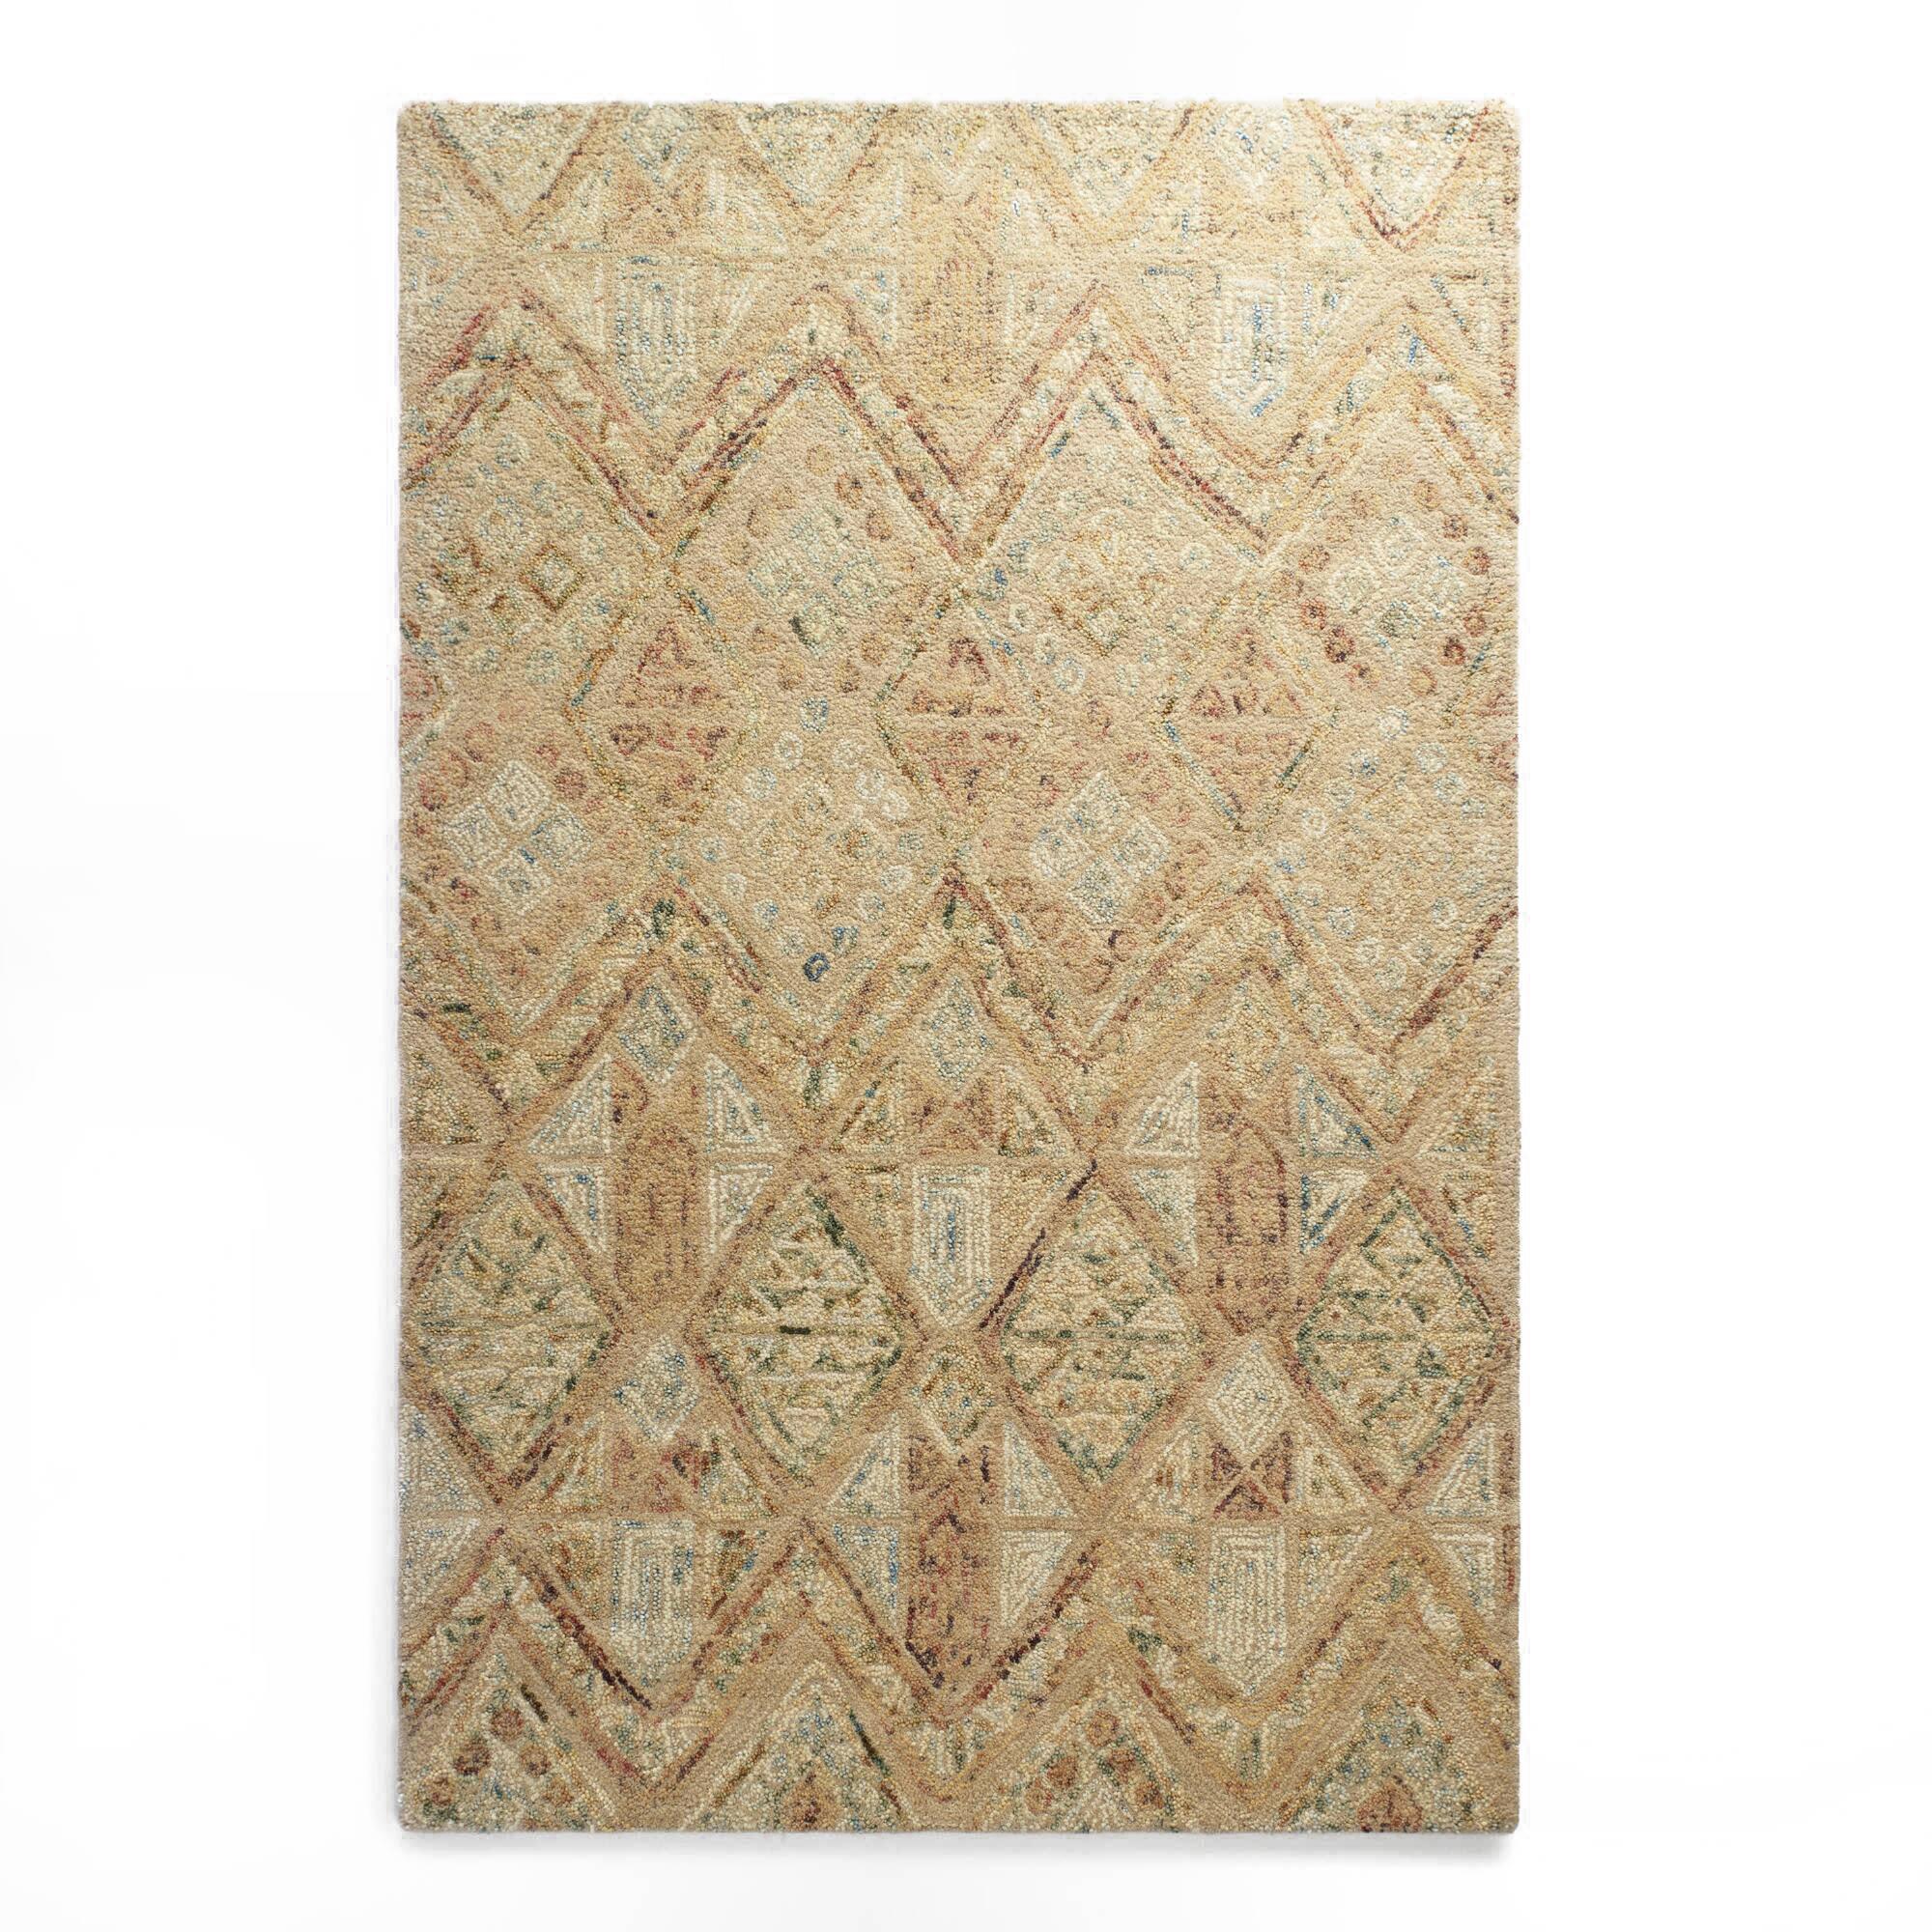 light-brown-rug-world-market-2.jpg